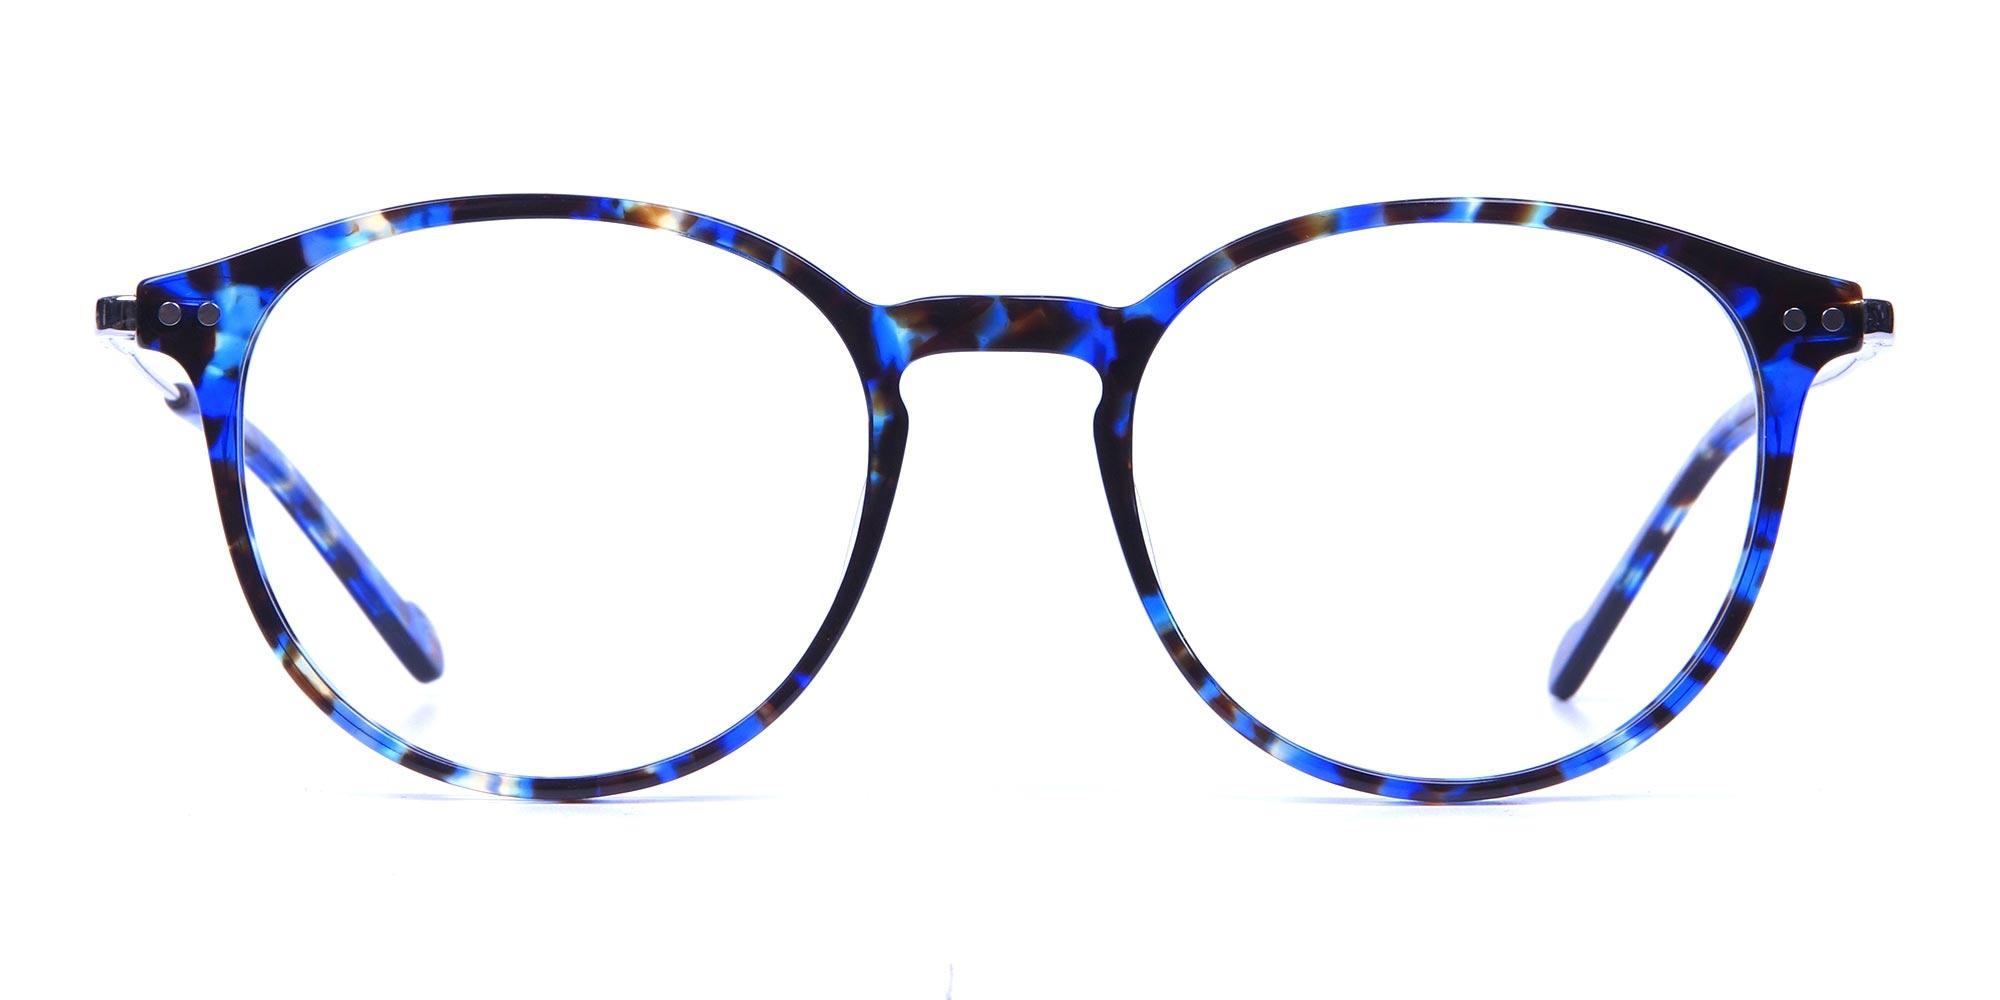 Ocean Blue Tortoise Glasses in Round 2020 trends